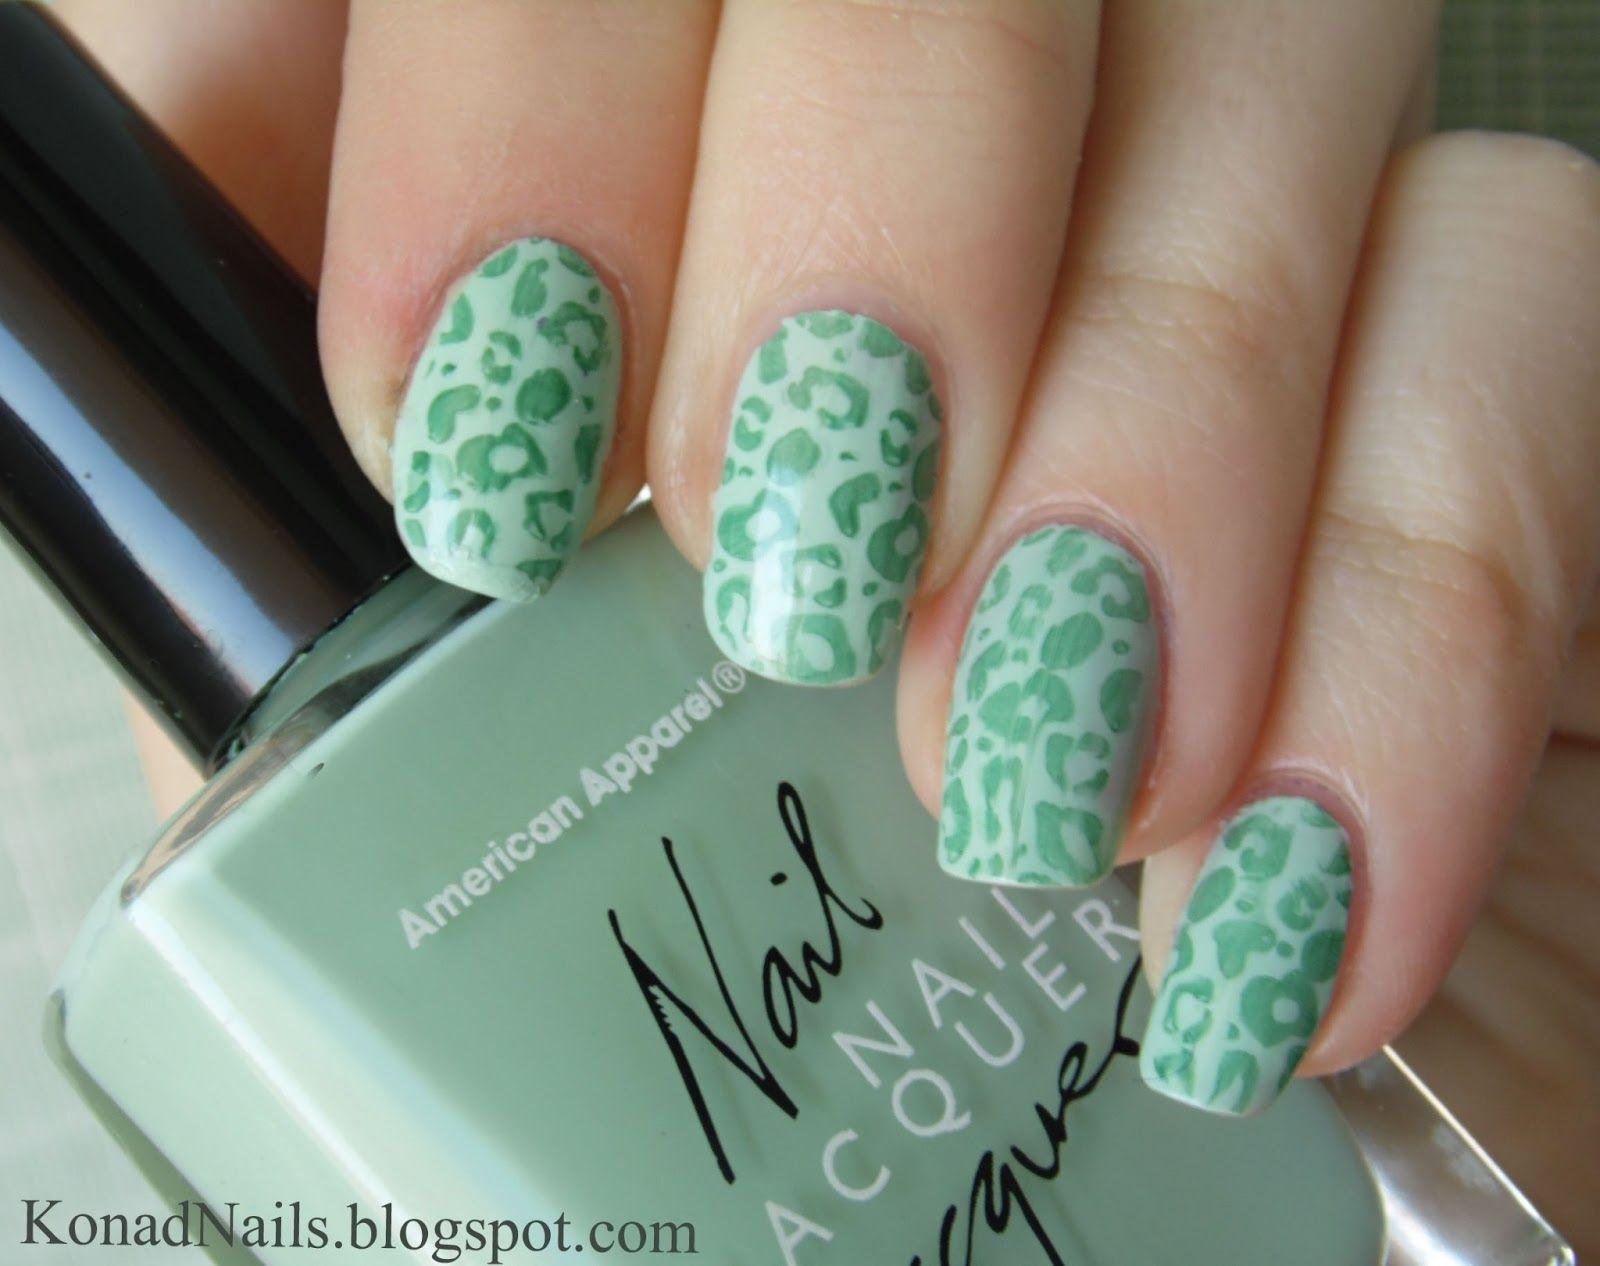 Konad m57 en doble verde | Nails | Pinterest | Uña decoradas ...